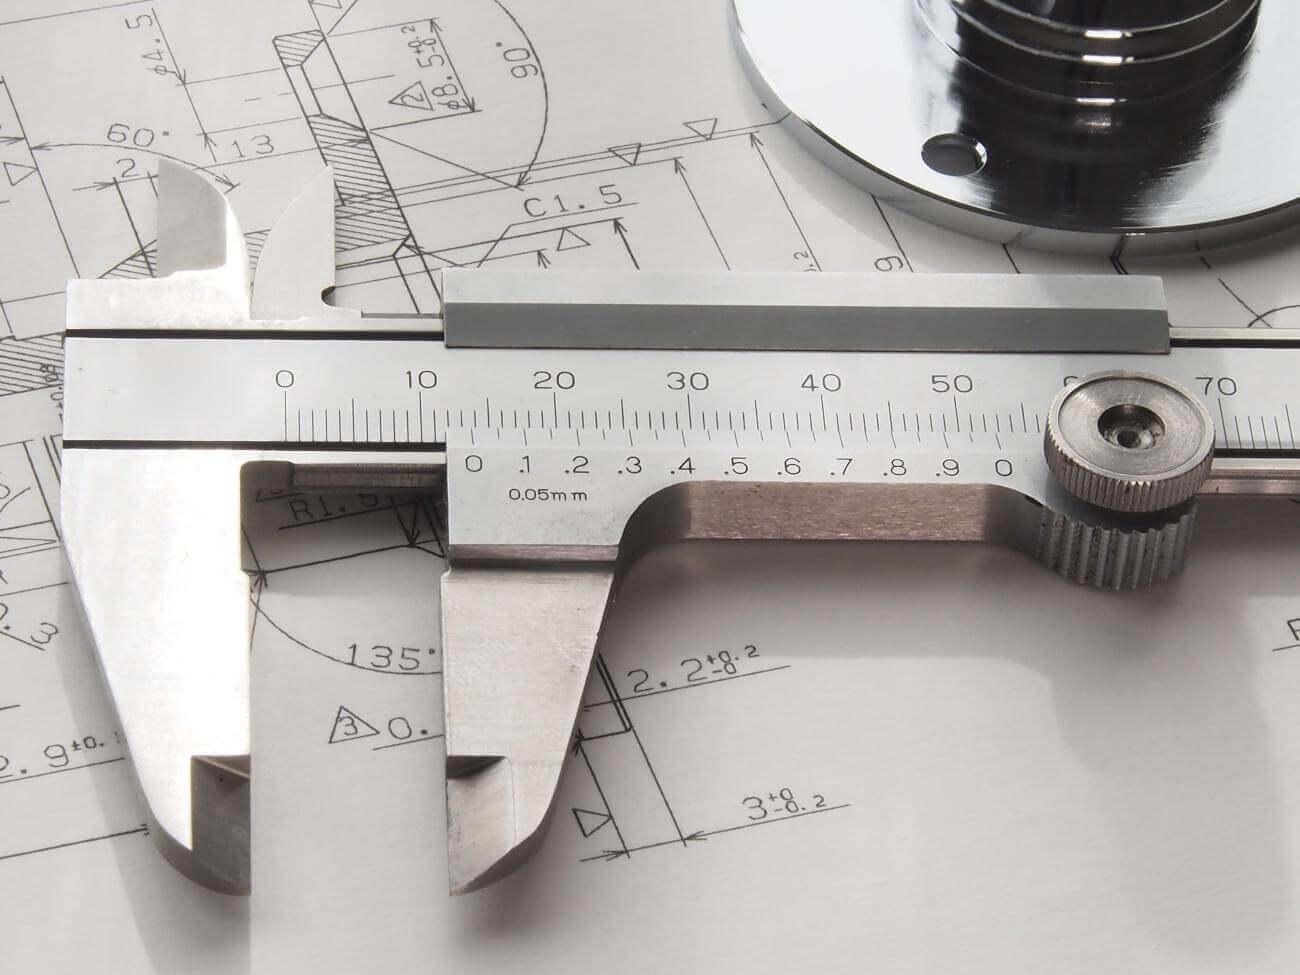 087fb4421e1f88 マシニングセンタは高価で大型の加工装置というイメージを持っている方がいるかもしれません。しかしマシニングセンタは量産部品の作成において、人件費の削減や加工  ...